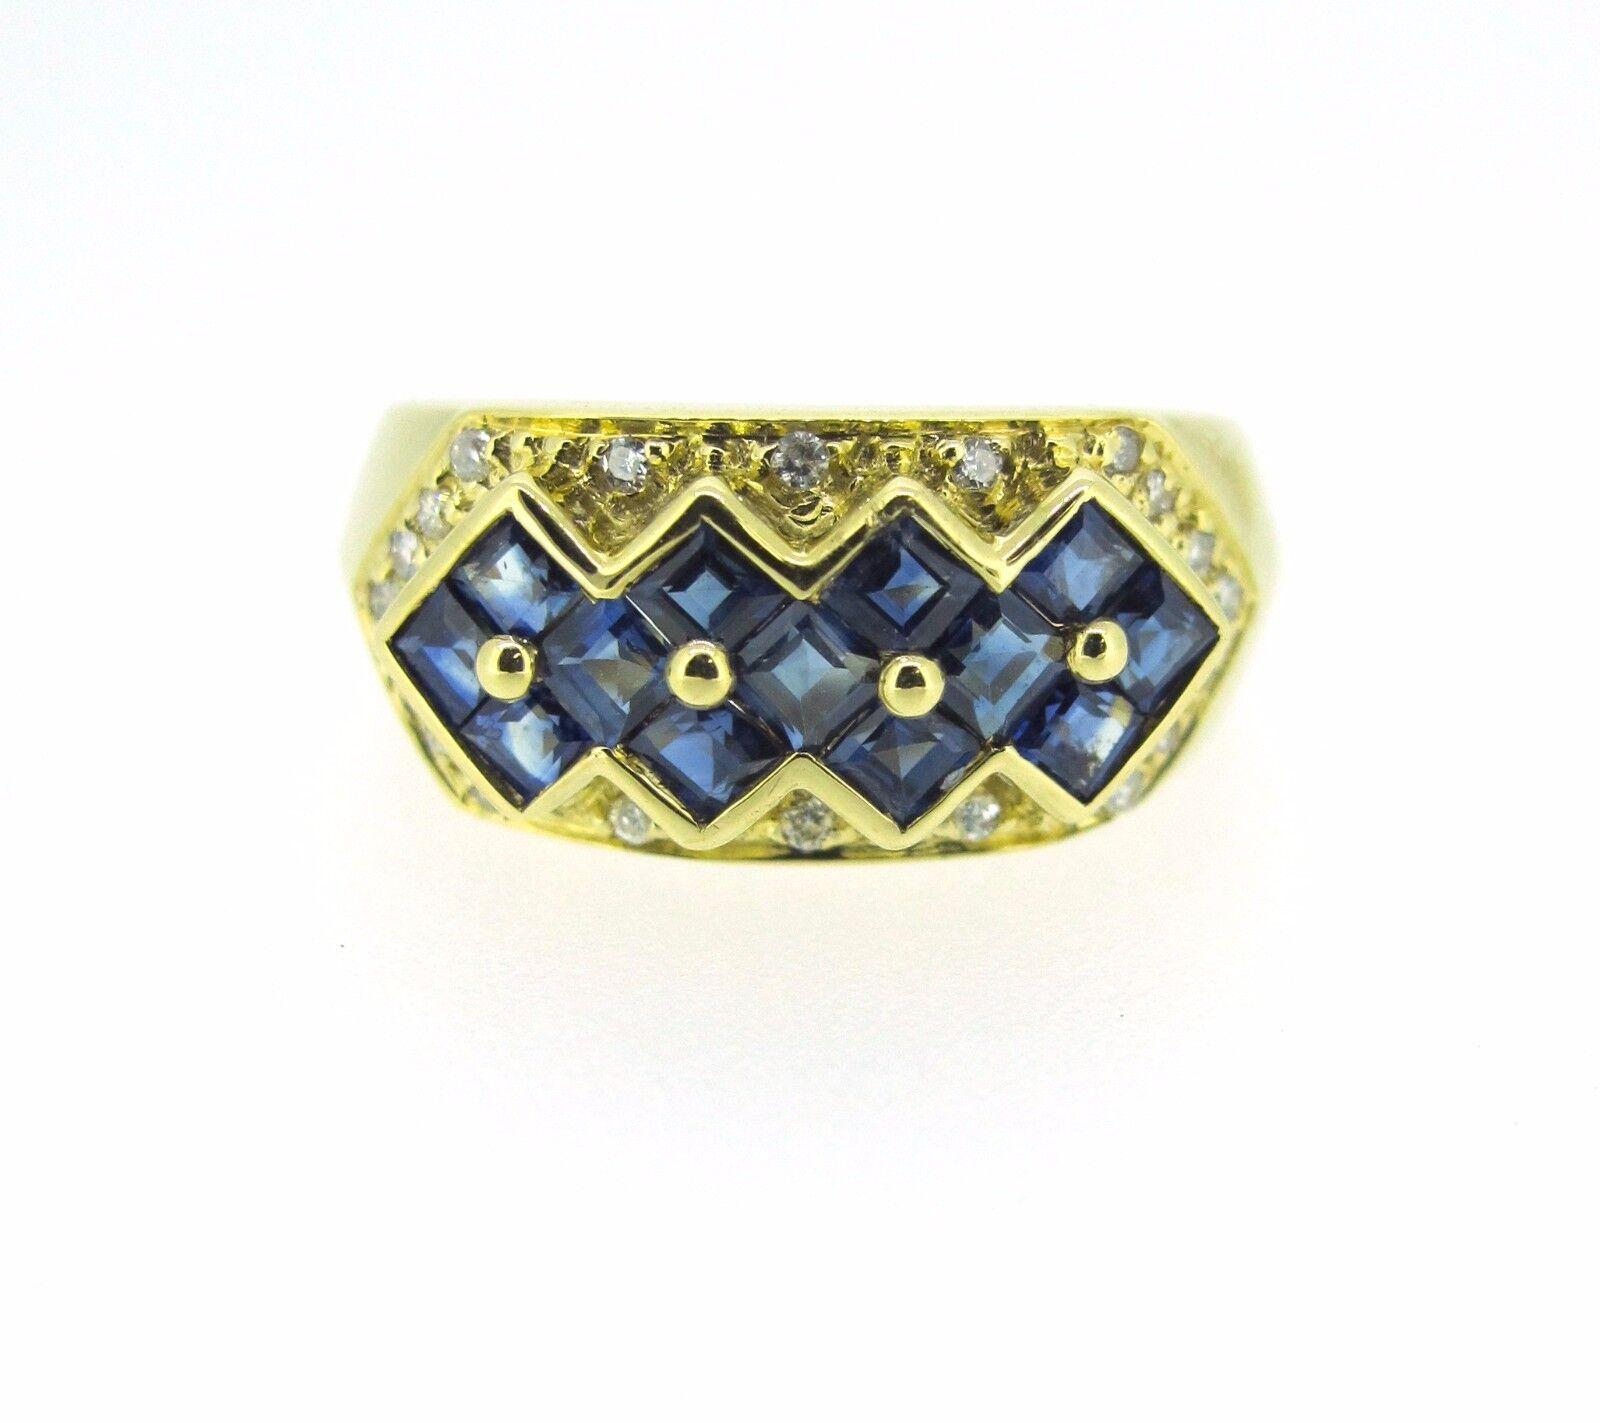 .12 ct tw DIAMONDS Round Cut 18k Yellow gold SAPPHIRES Ladies Ring Size 6.75